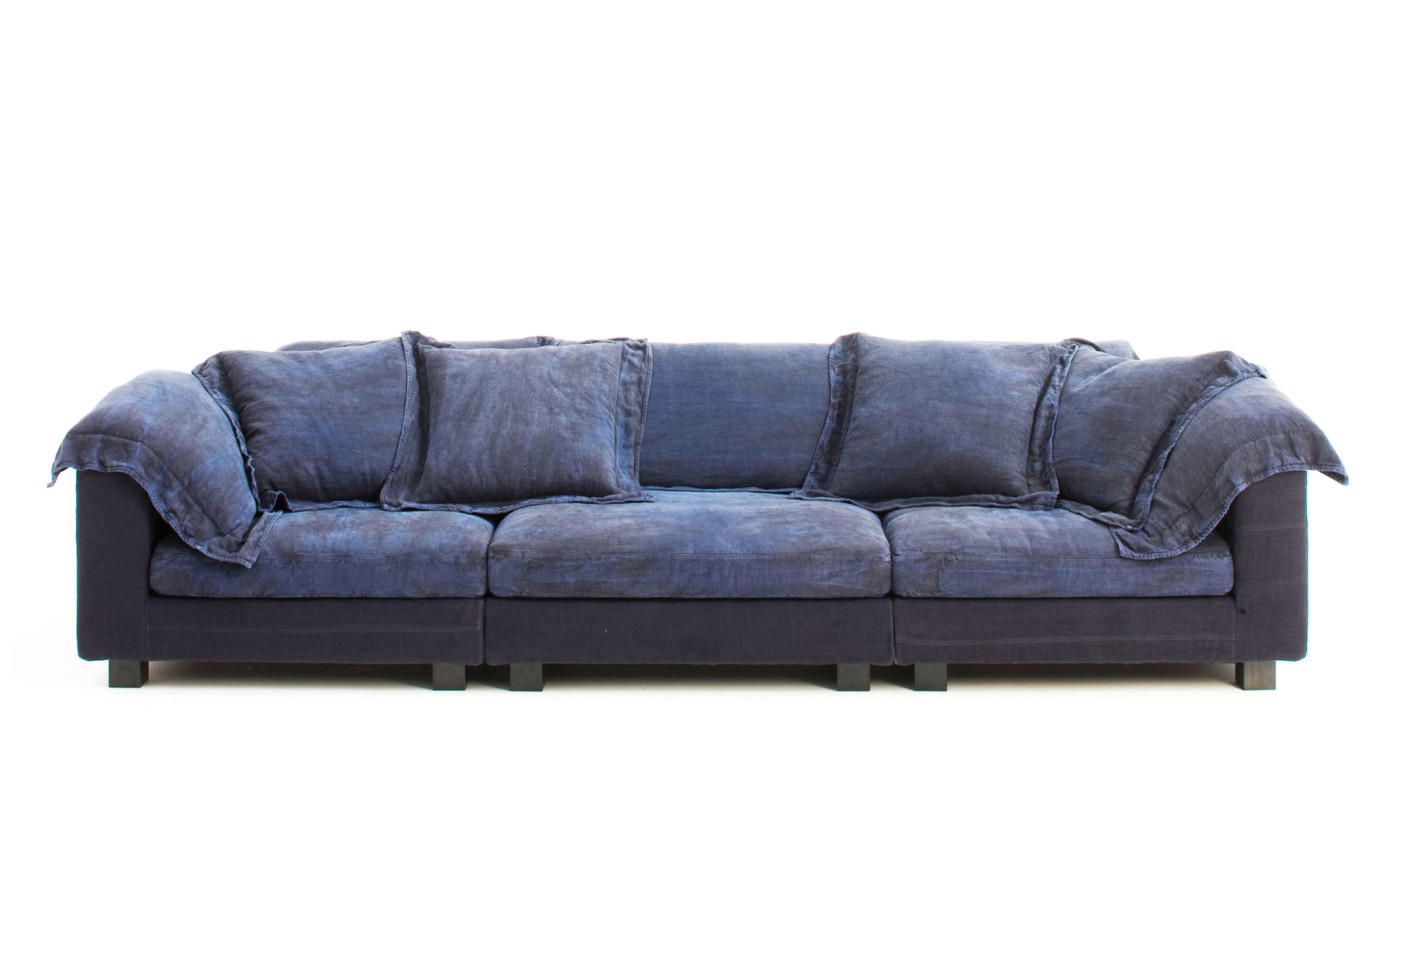 Diesel Collection Nebula Sofa By Moroso STYLEPARK